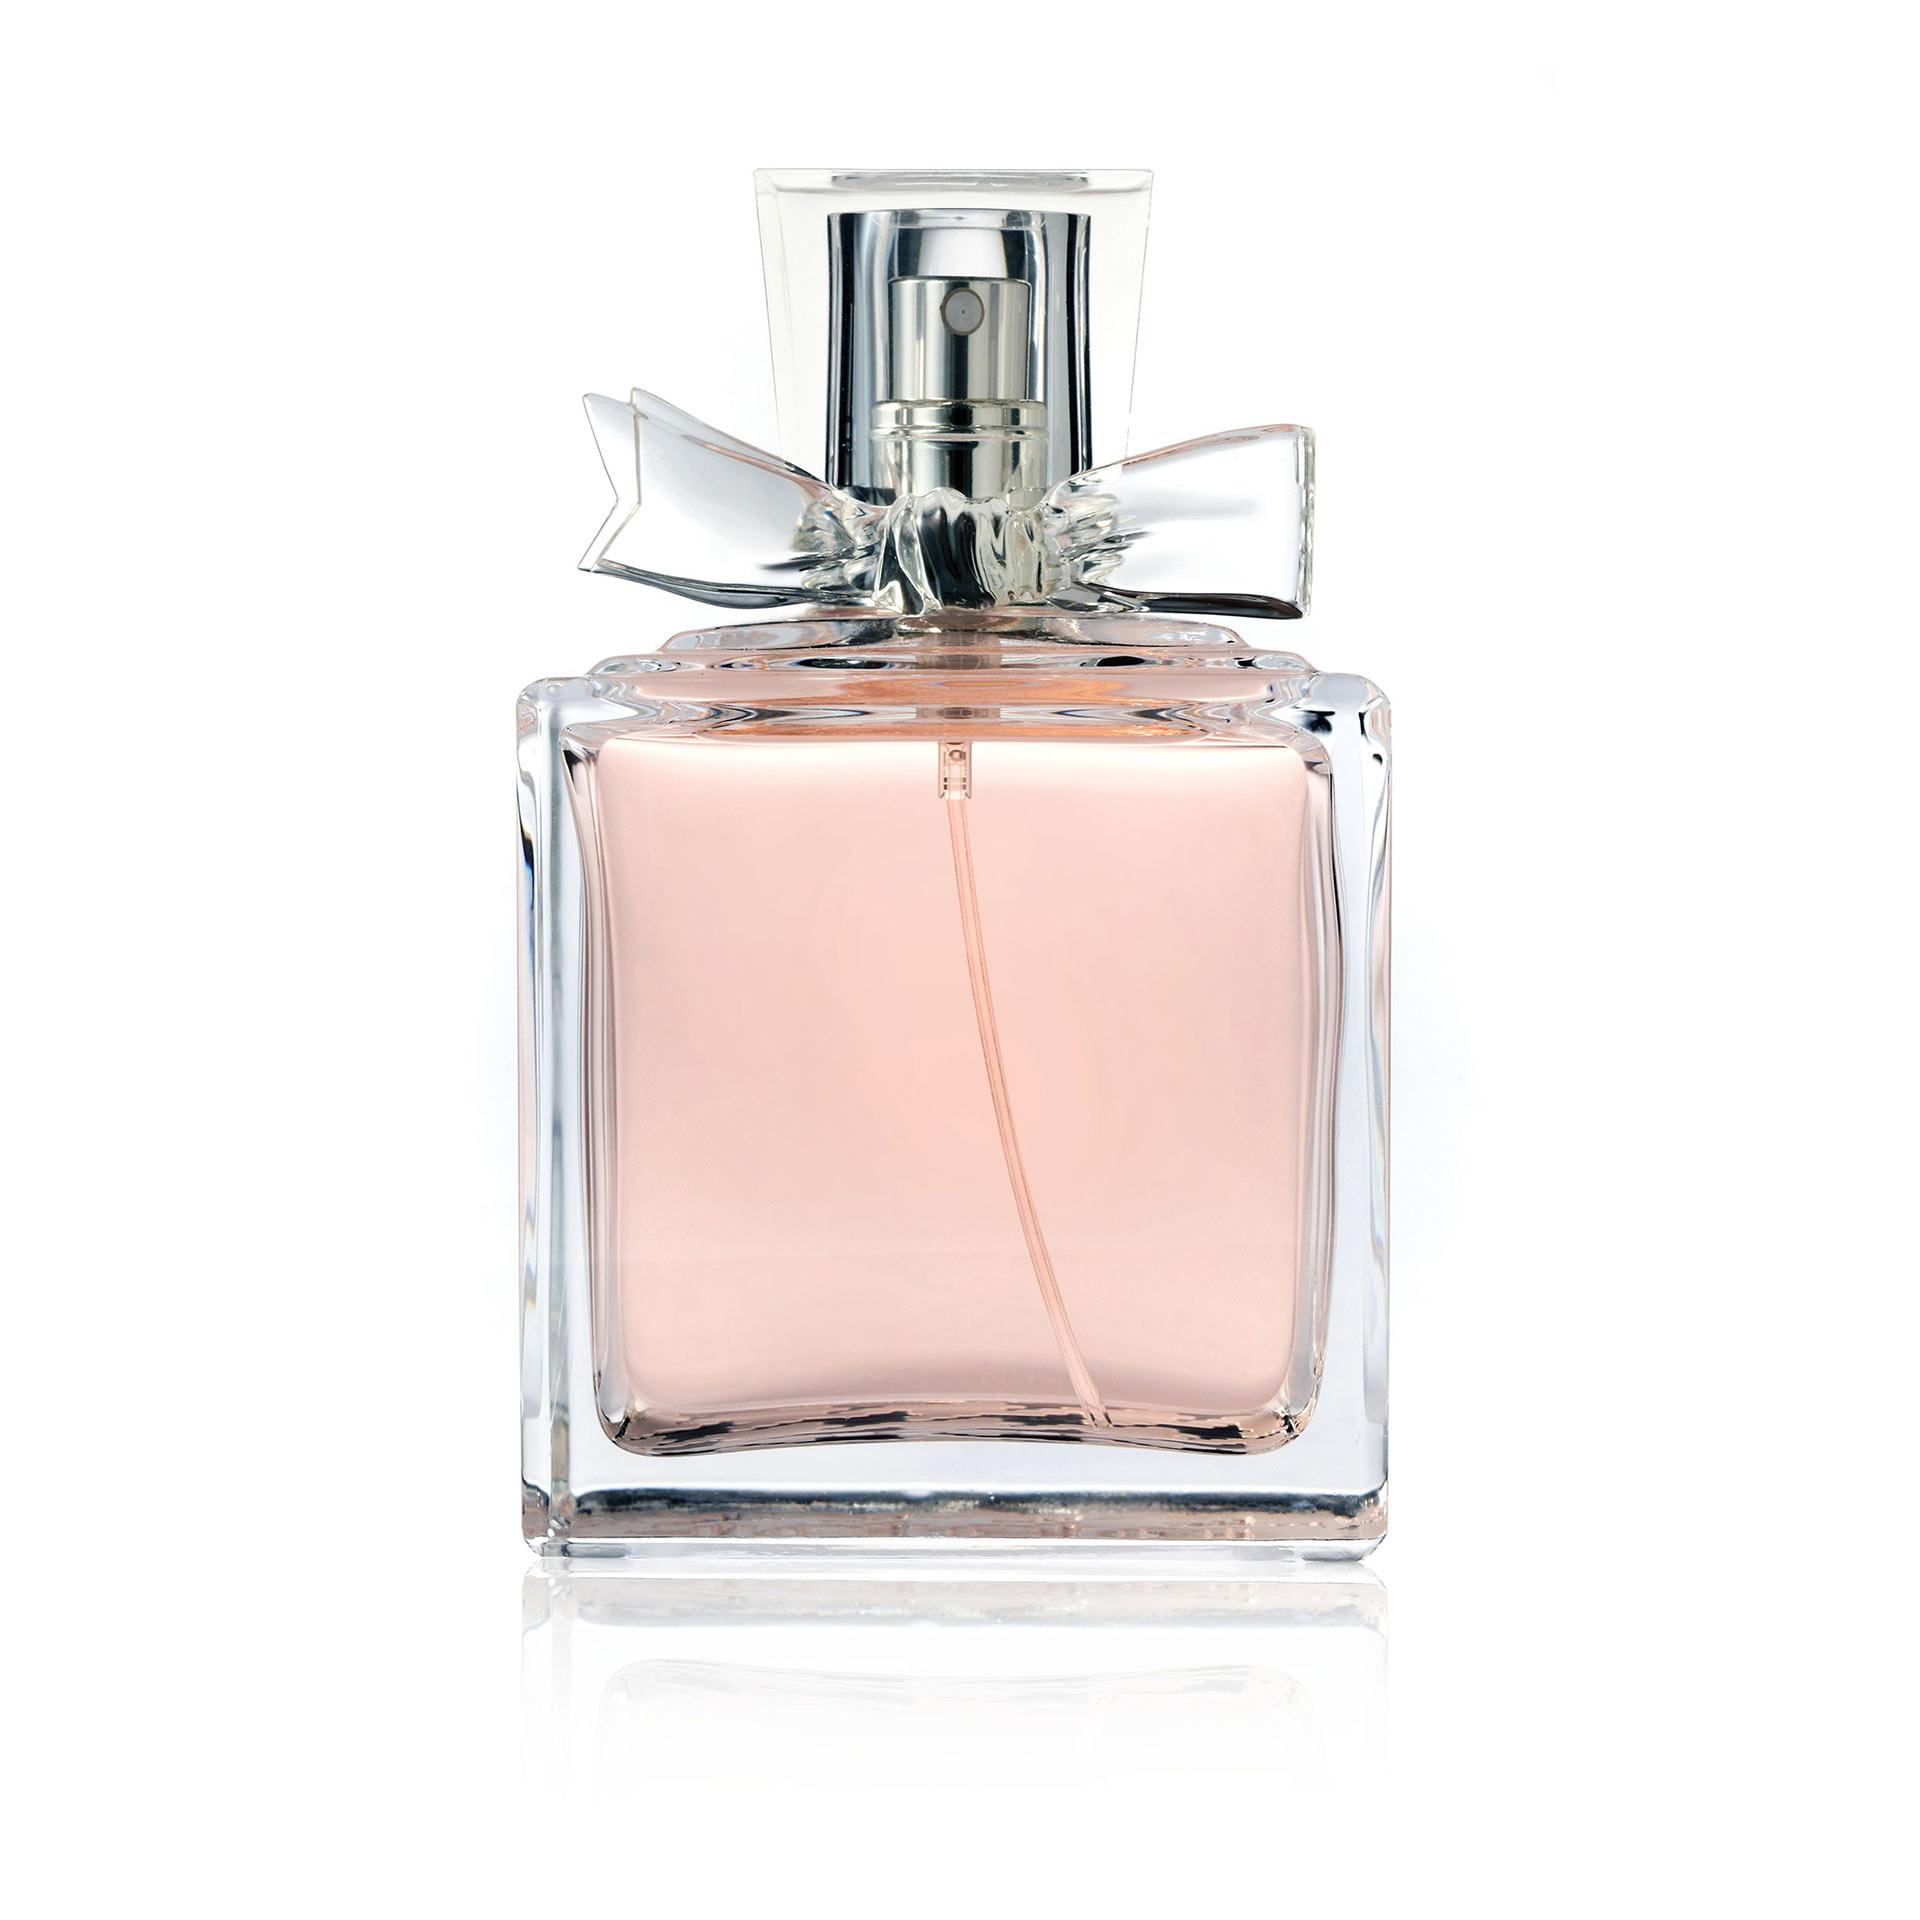 Fragrances Perfume Bottle And Perfume Bottles: Women's Perfume